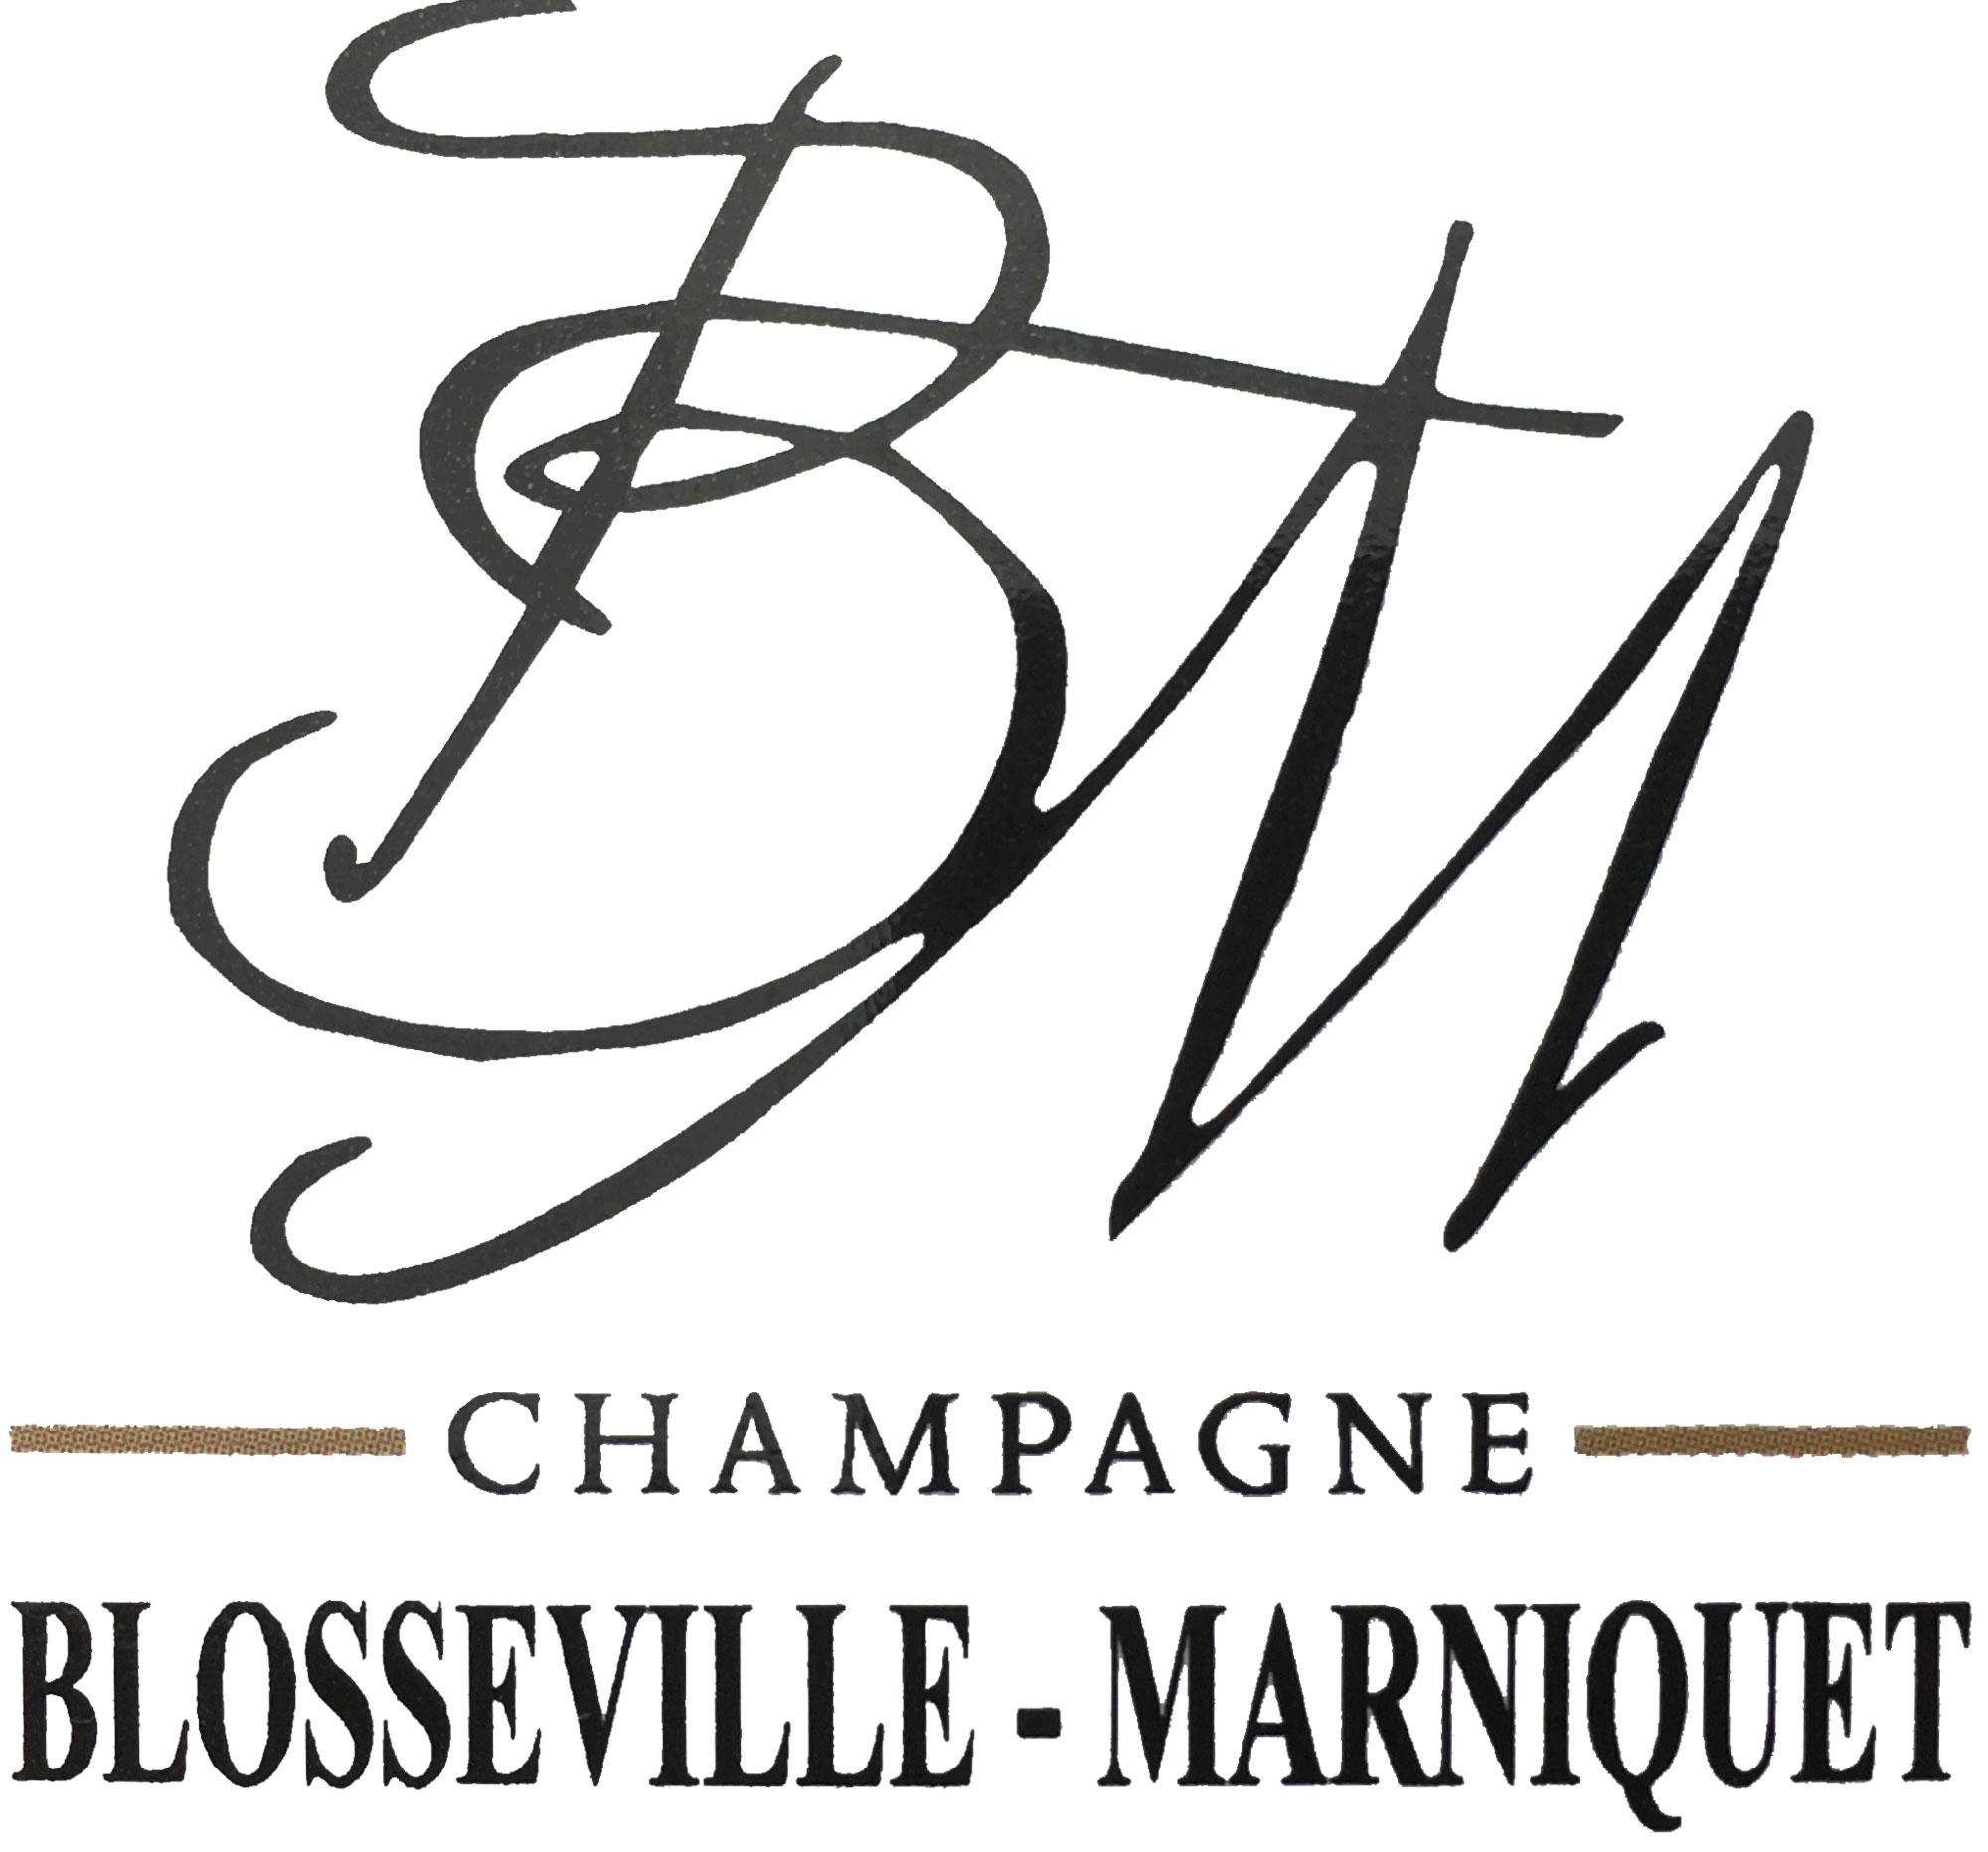 Blosseville Marniquet Champagne